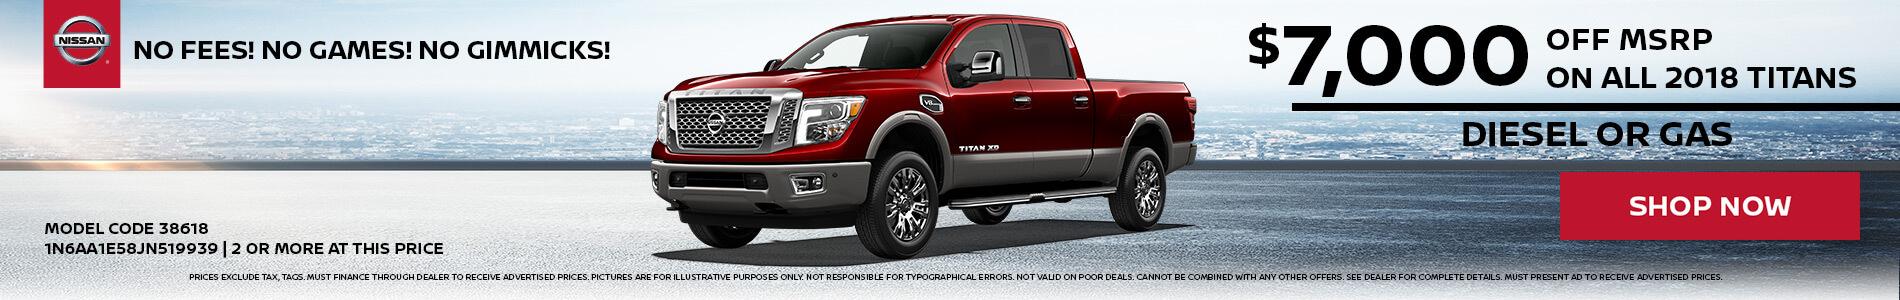 Nissan Titan $7,000 OFF MSRP